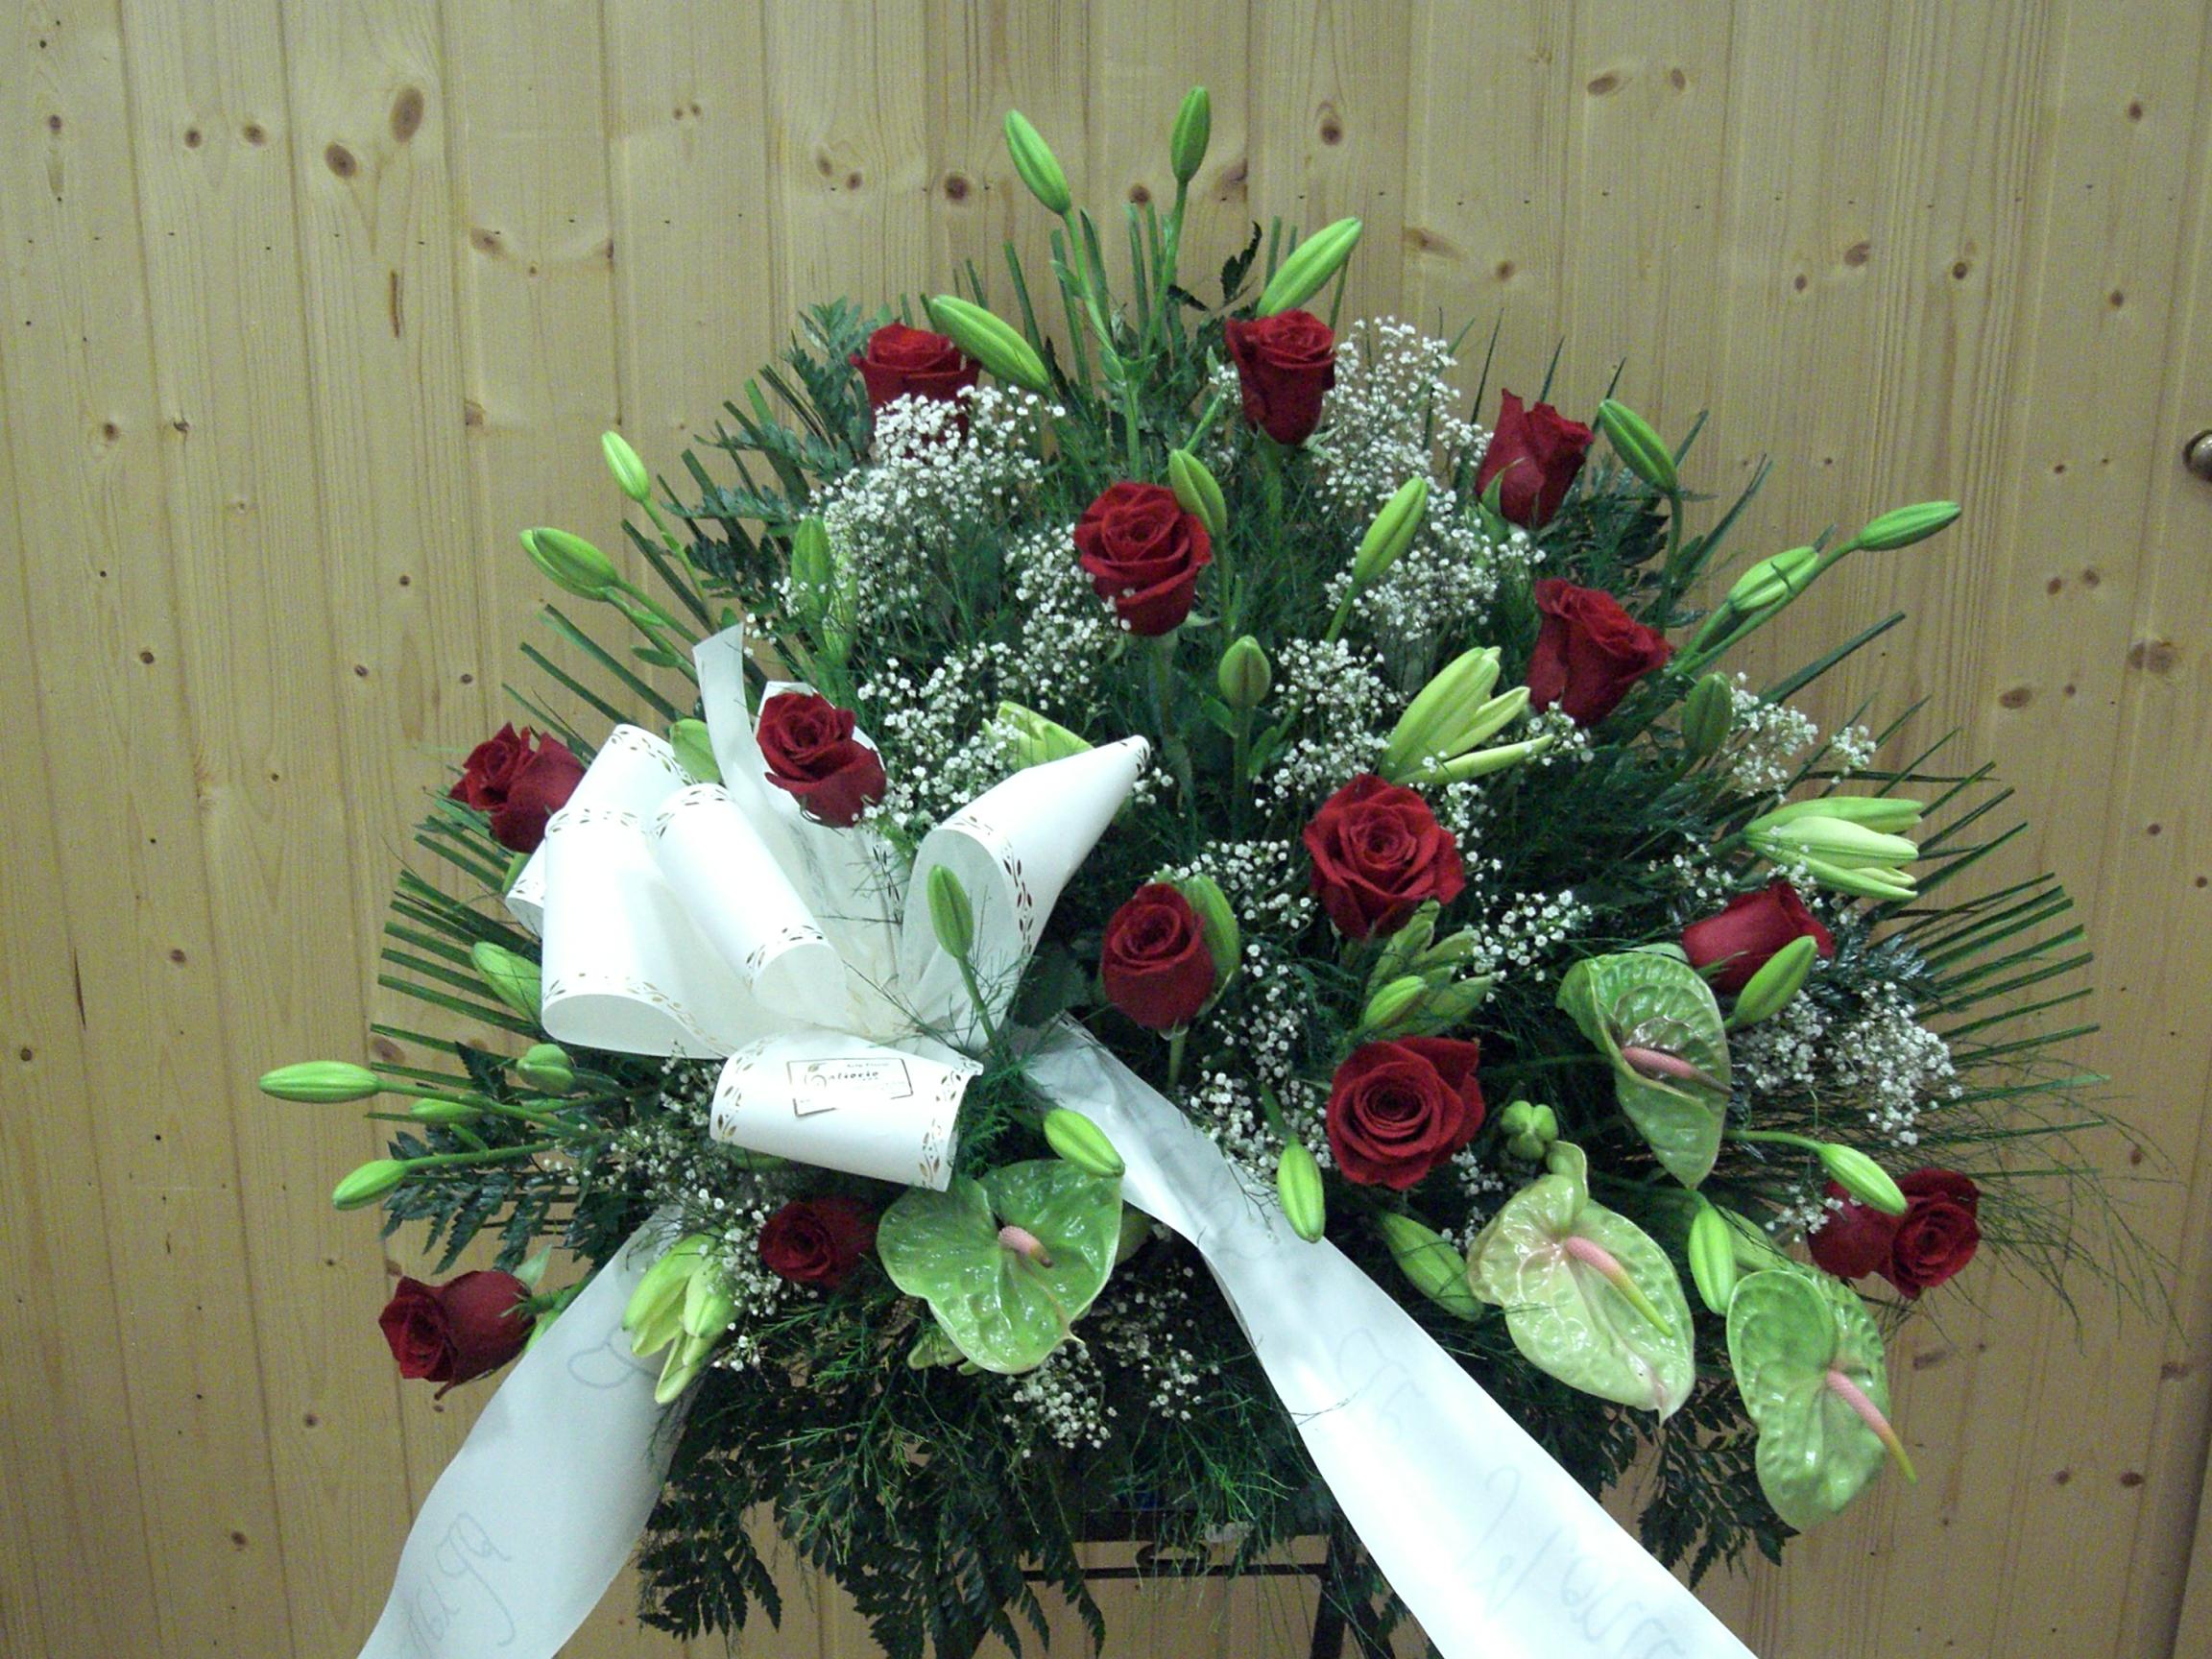 Centro funerario con rosas